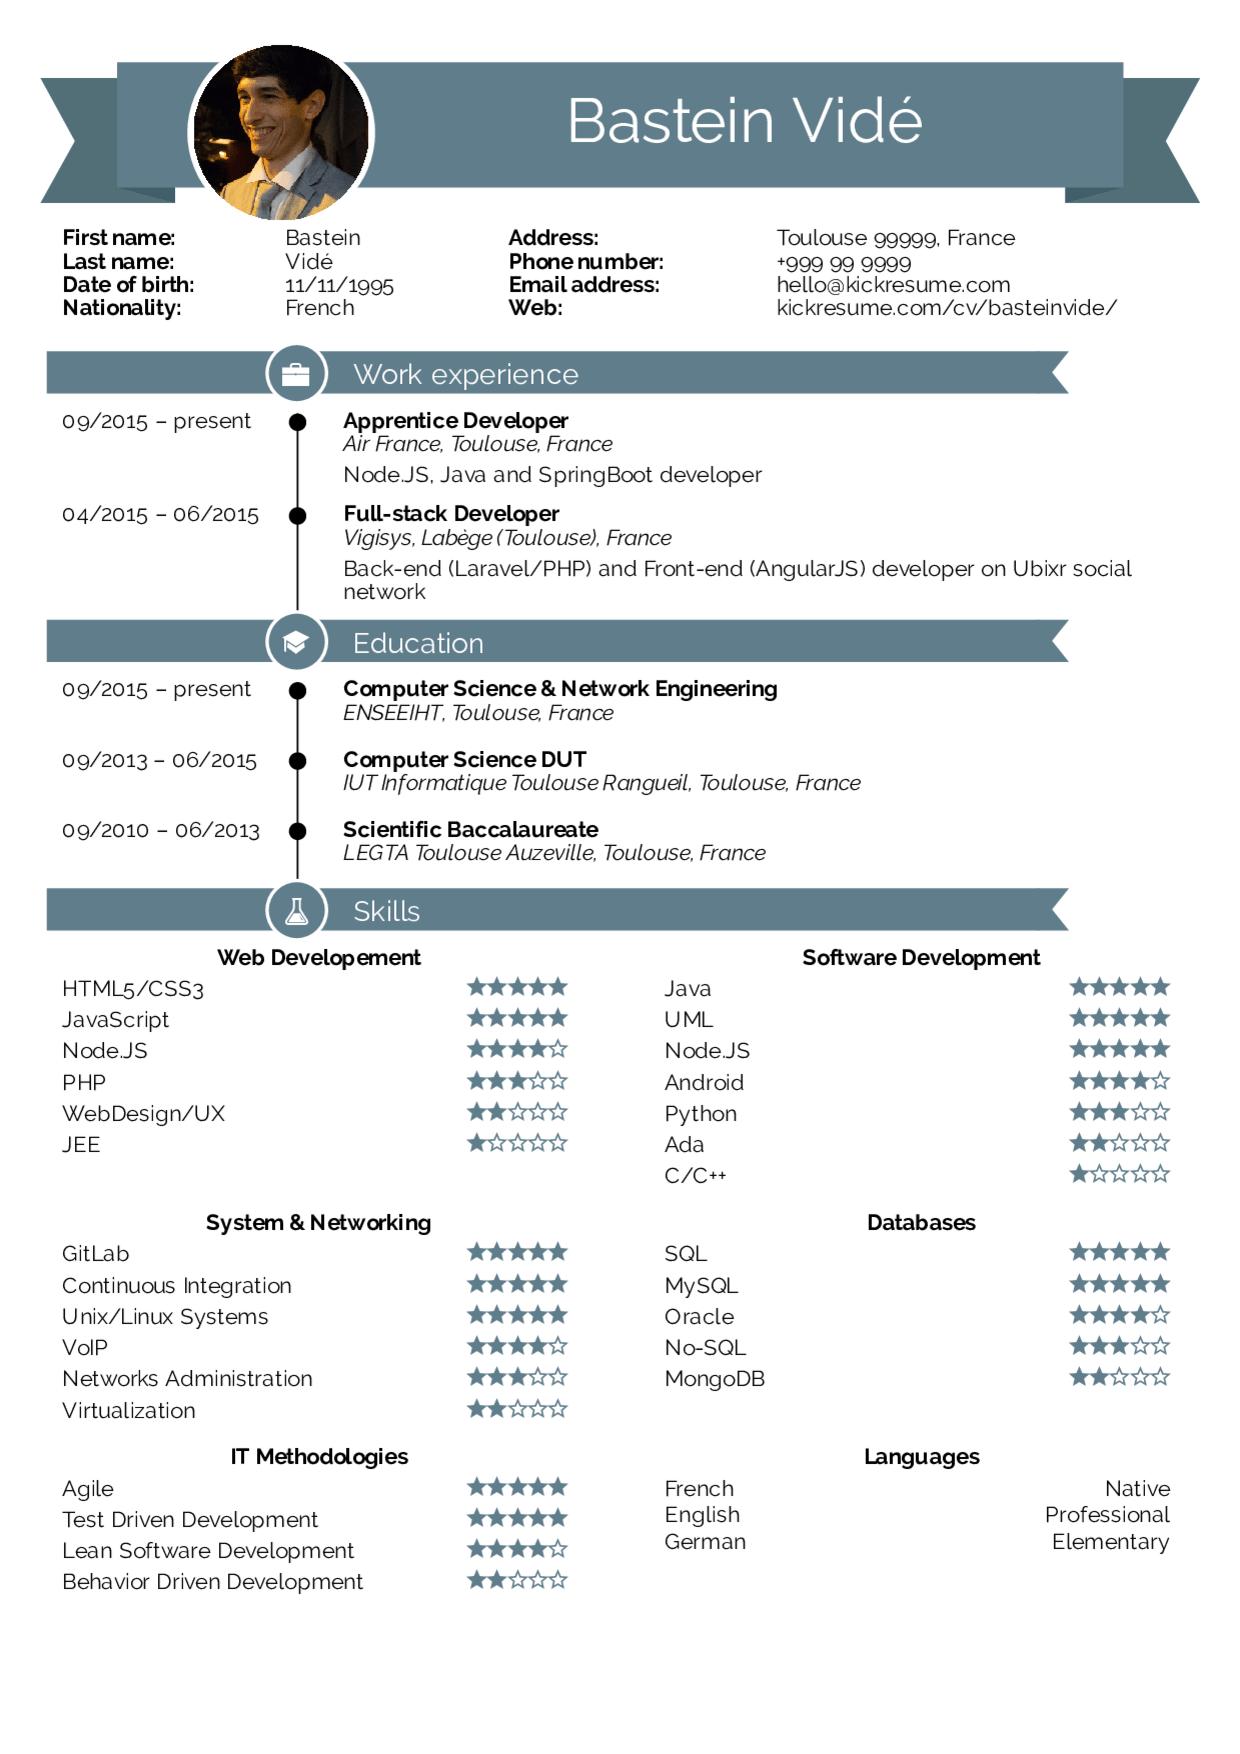 Sample Resume Templates, Sample Resume Templates sample